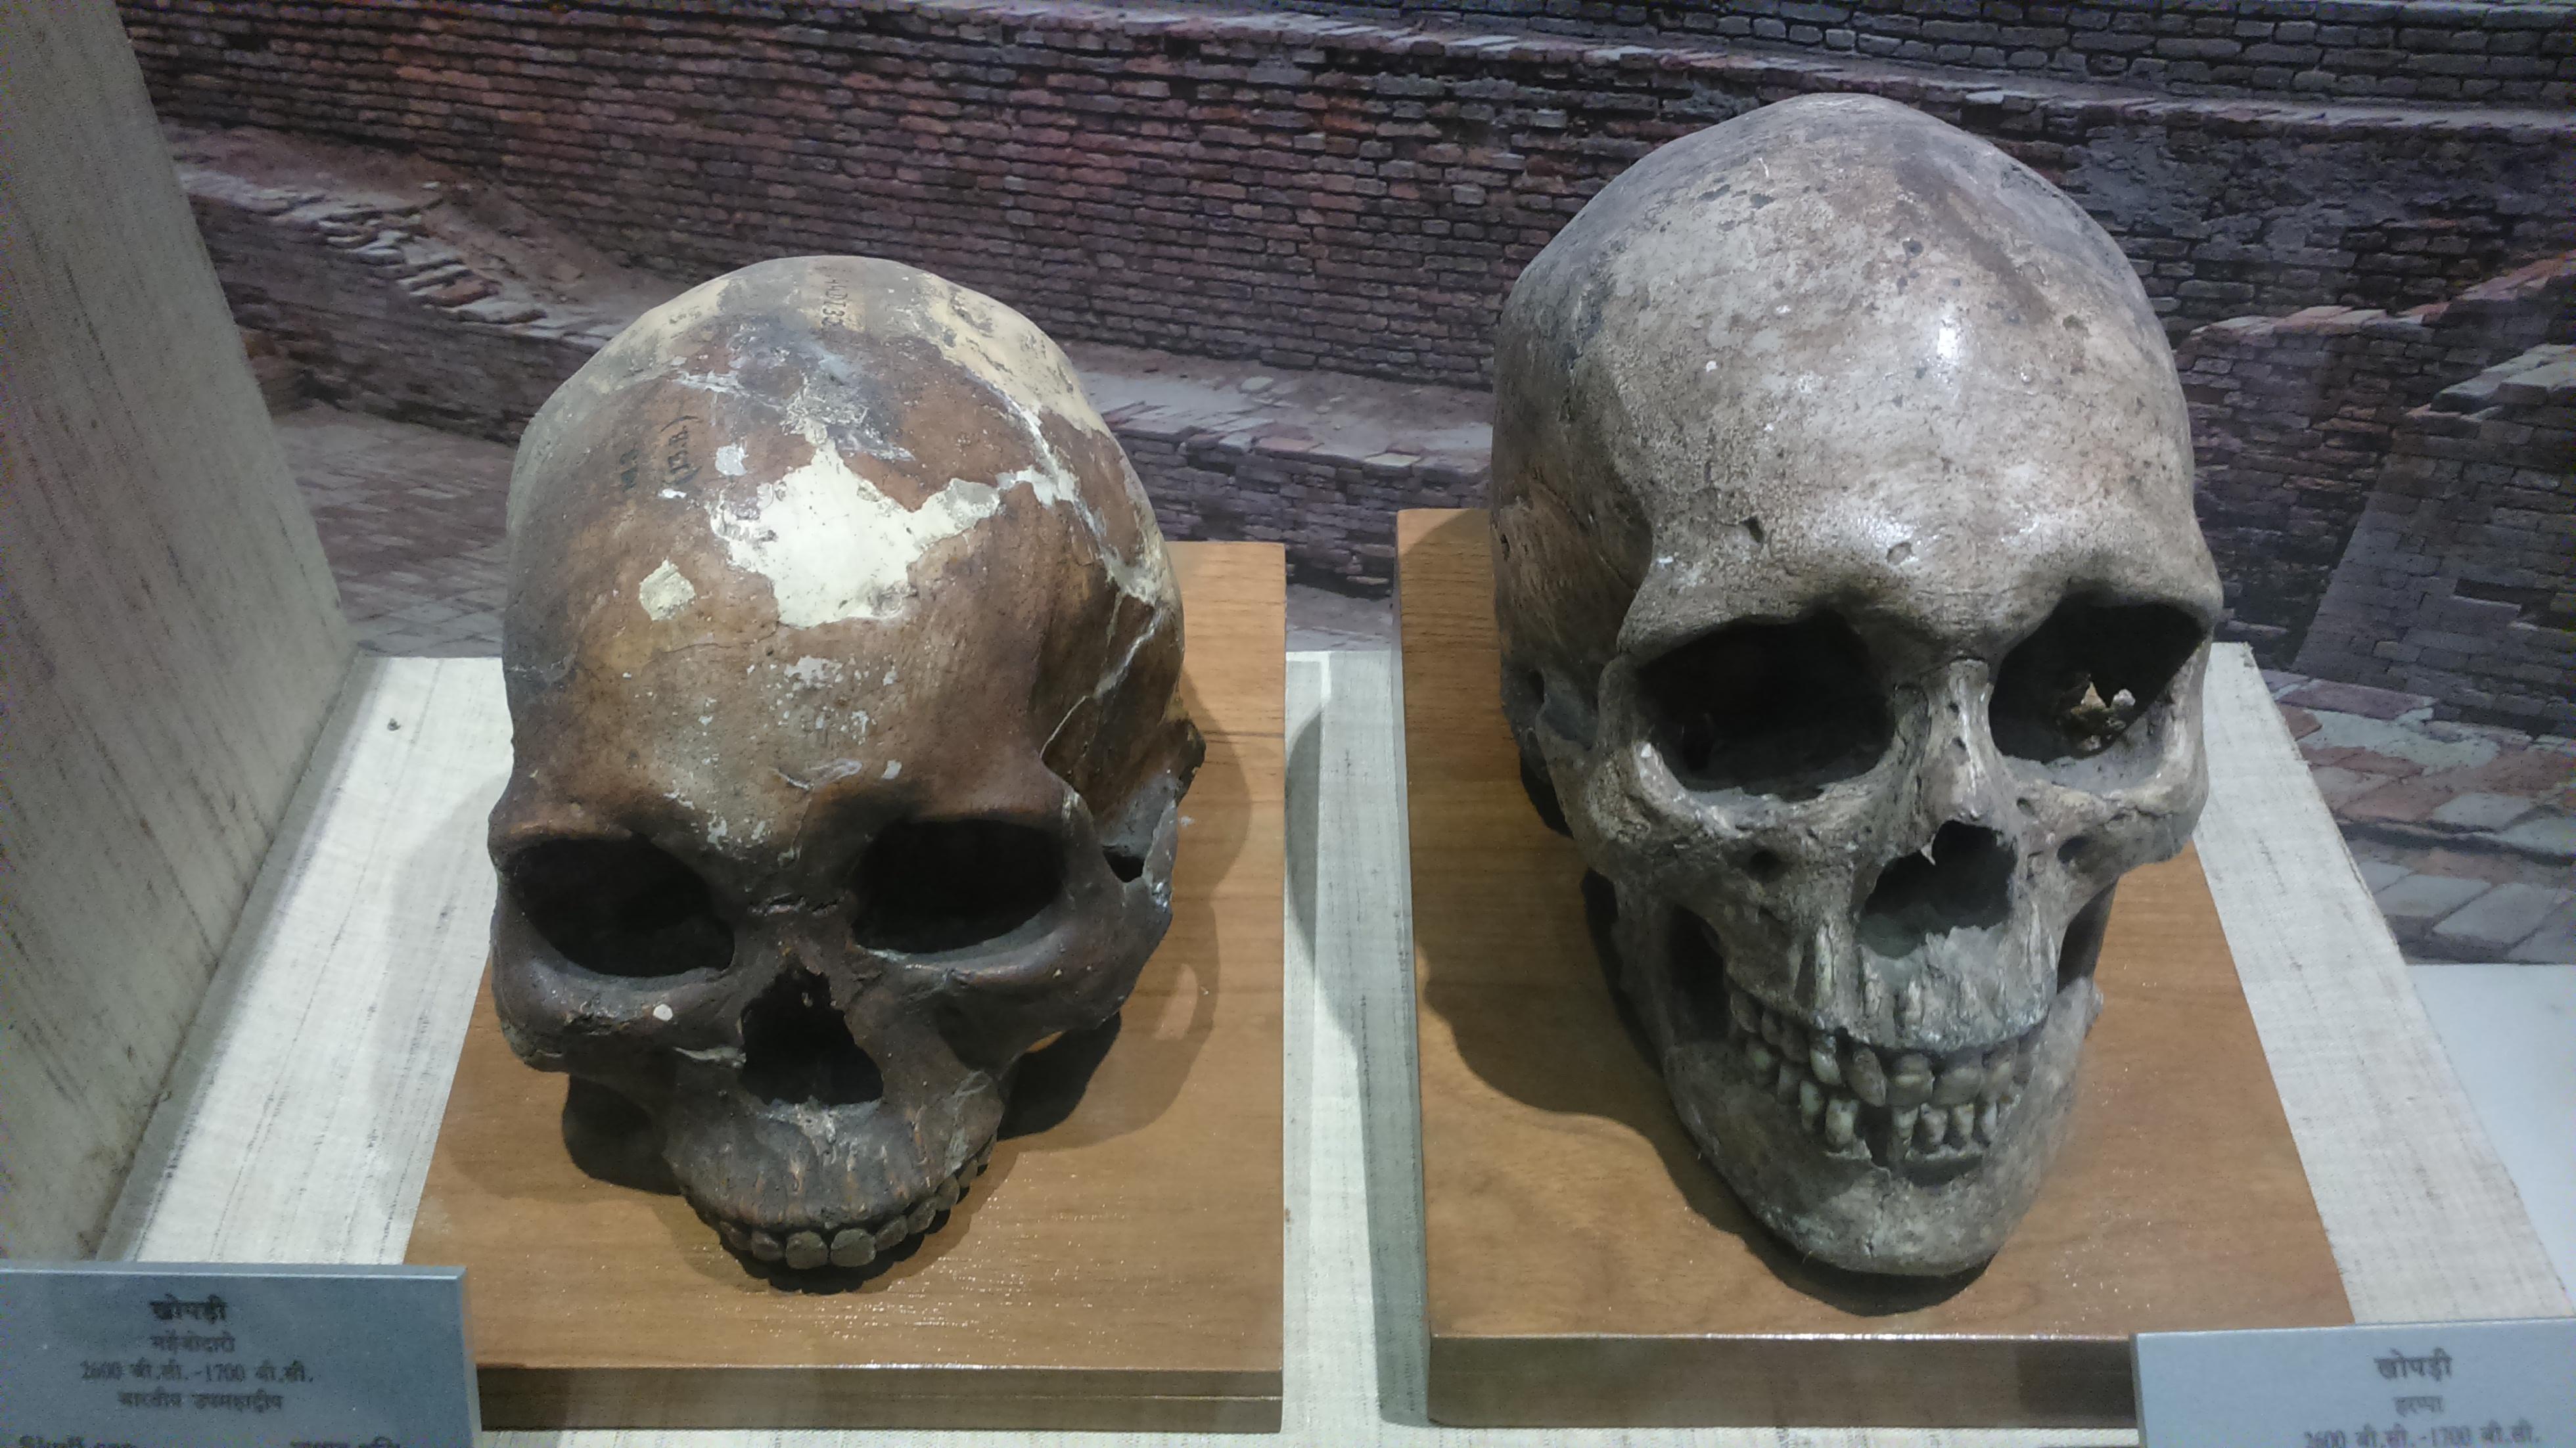 Skull of Indus Valley inhabitants, Photo by Royroydeb